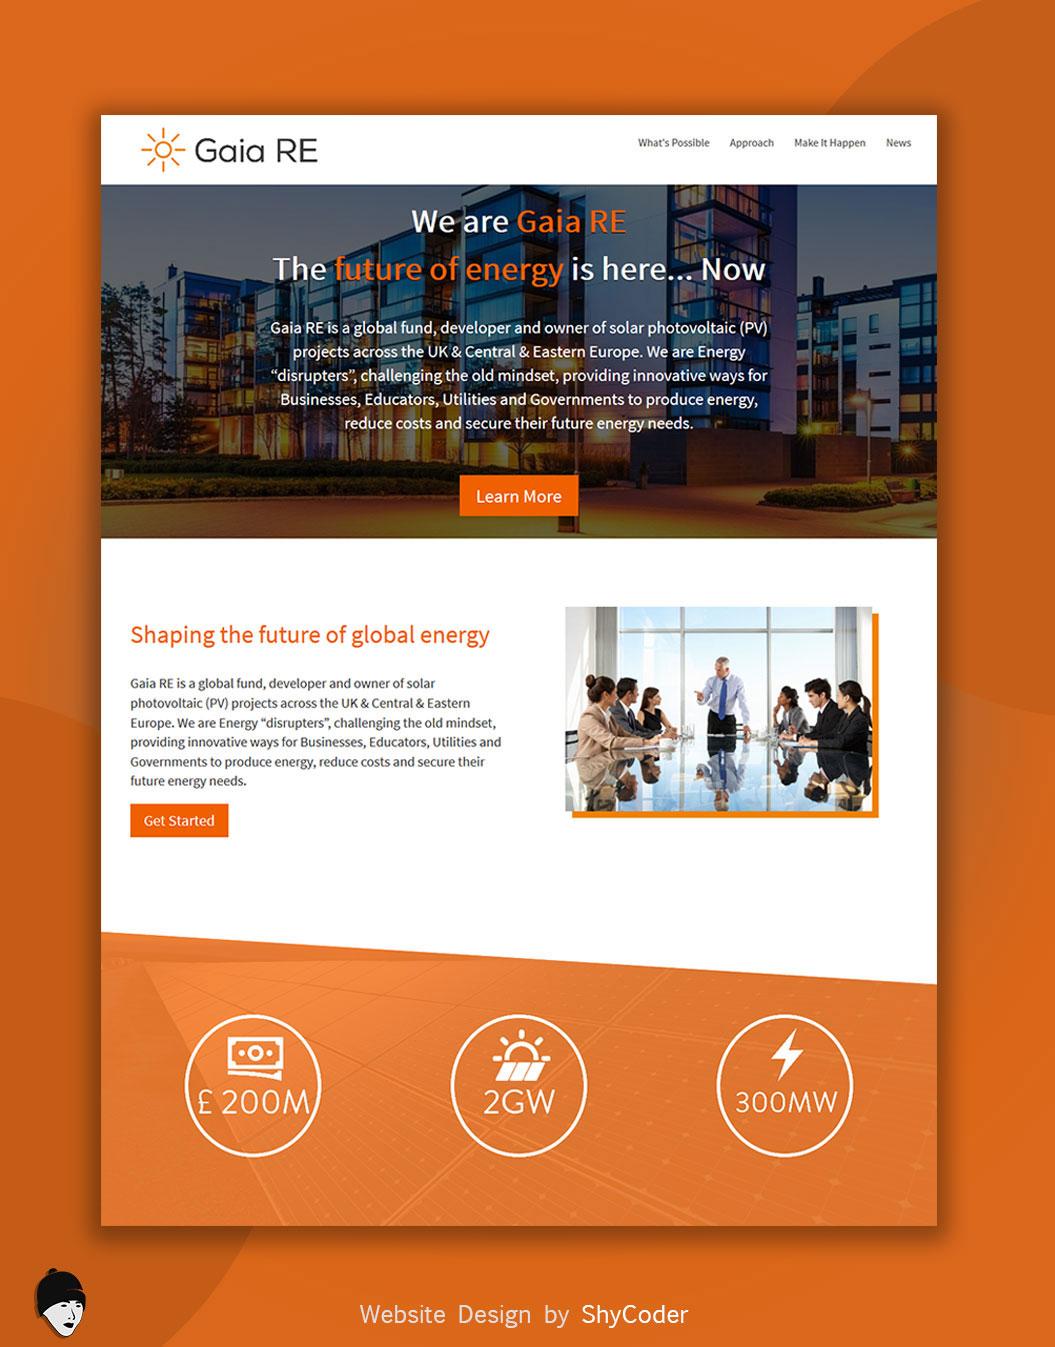 Gaia RE Website Design